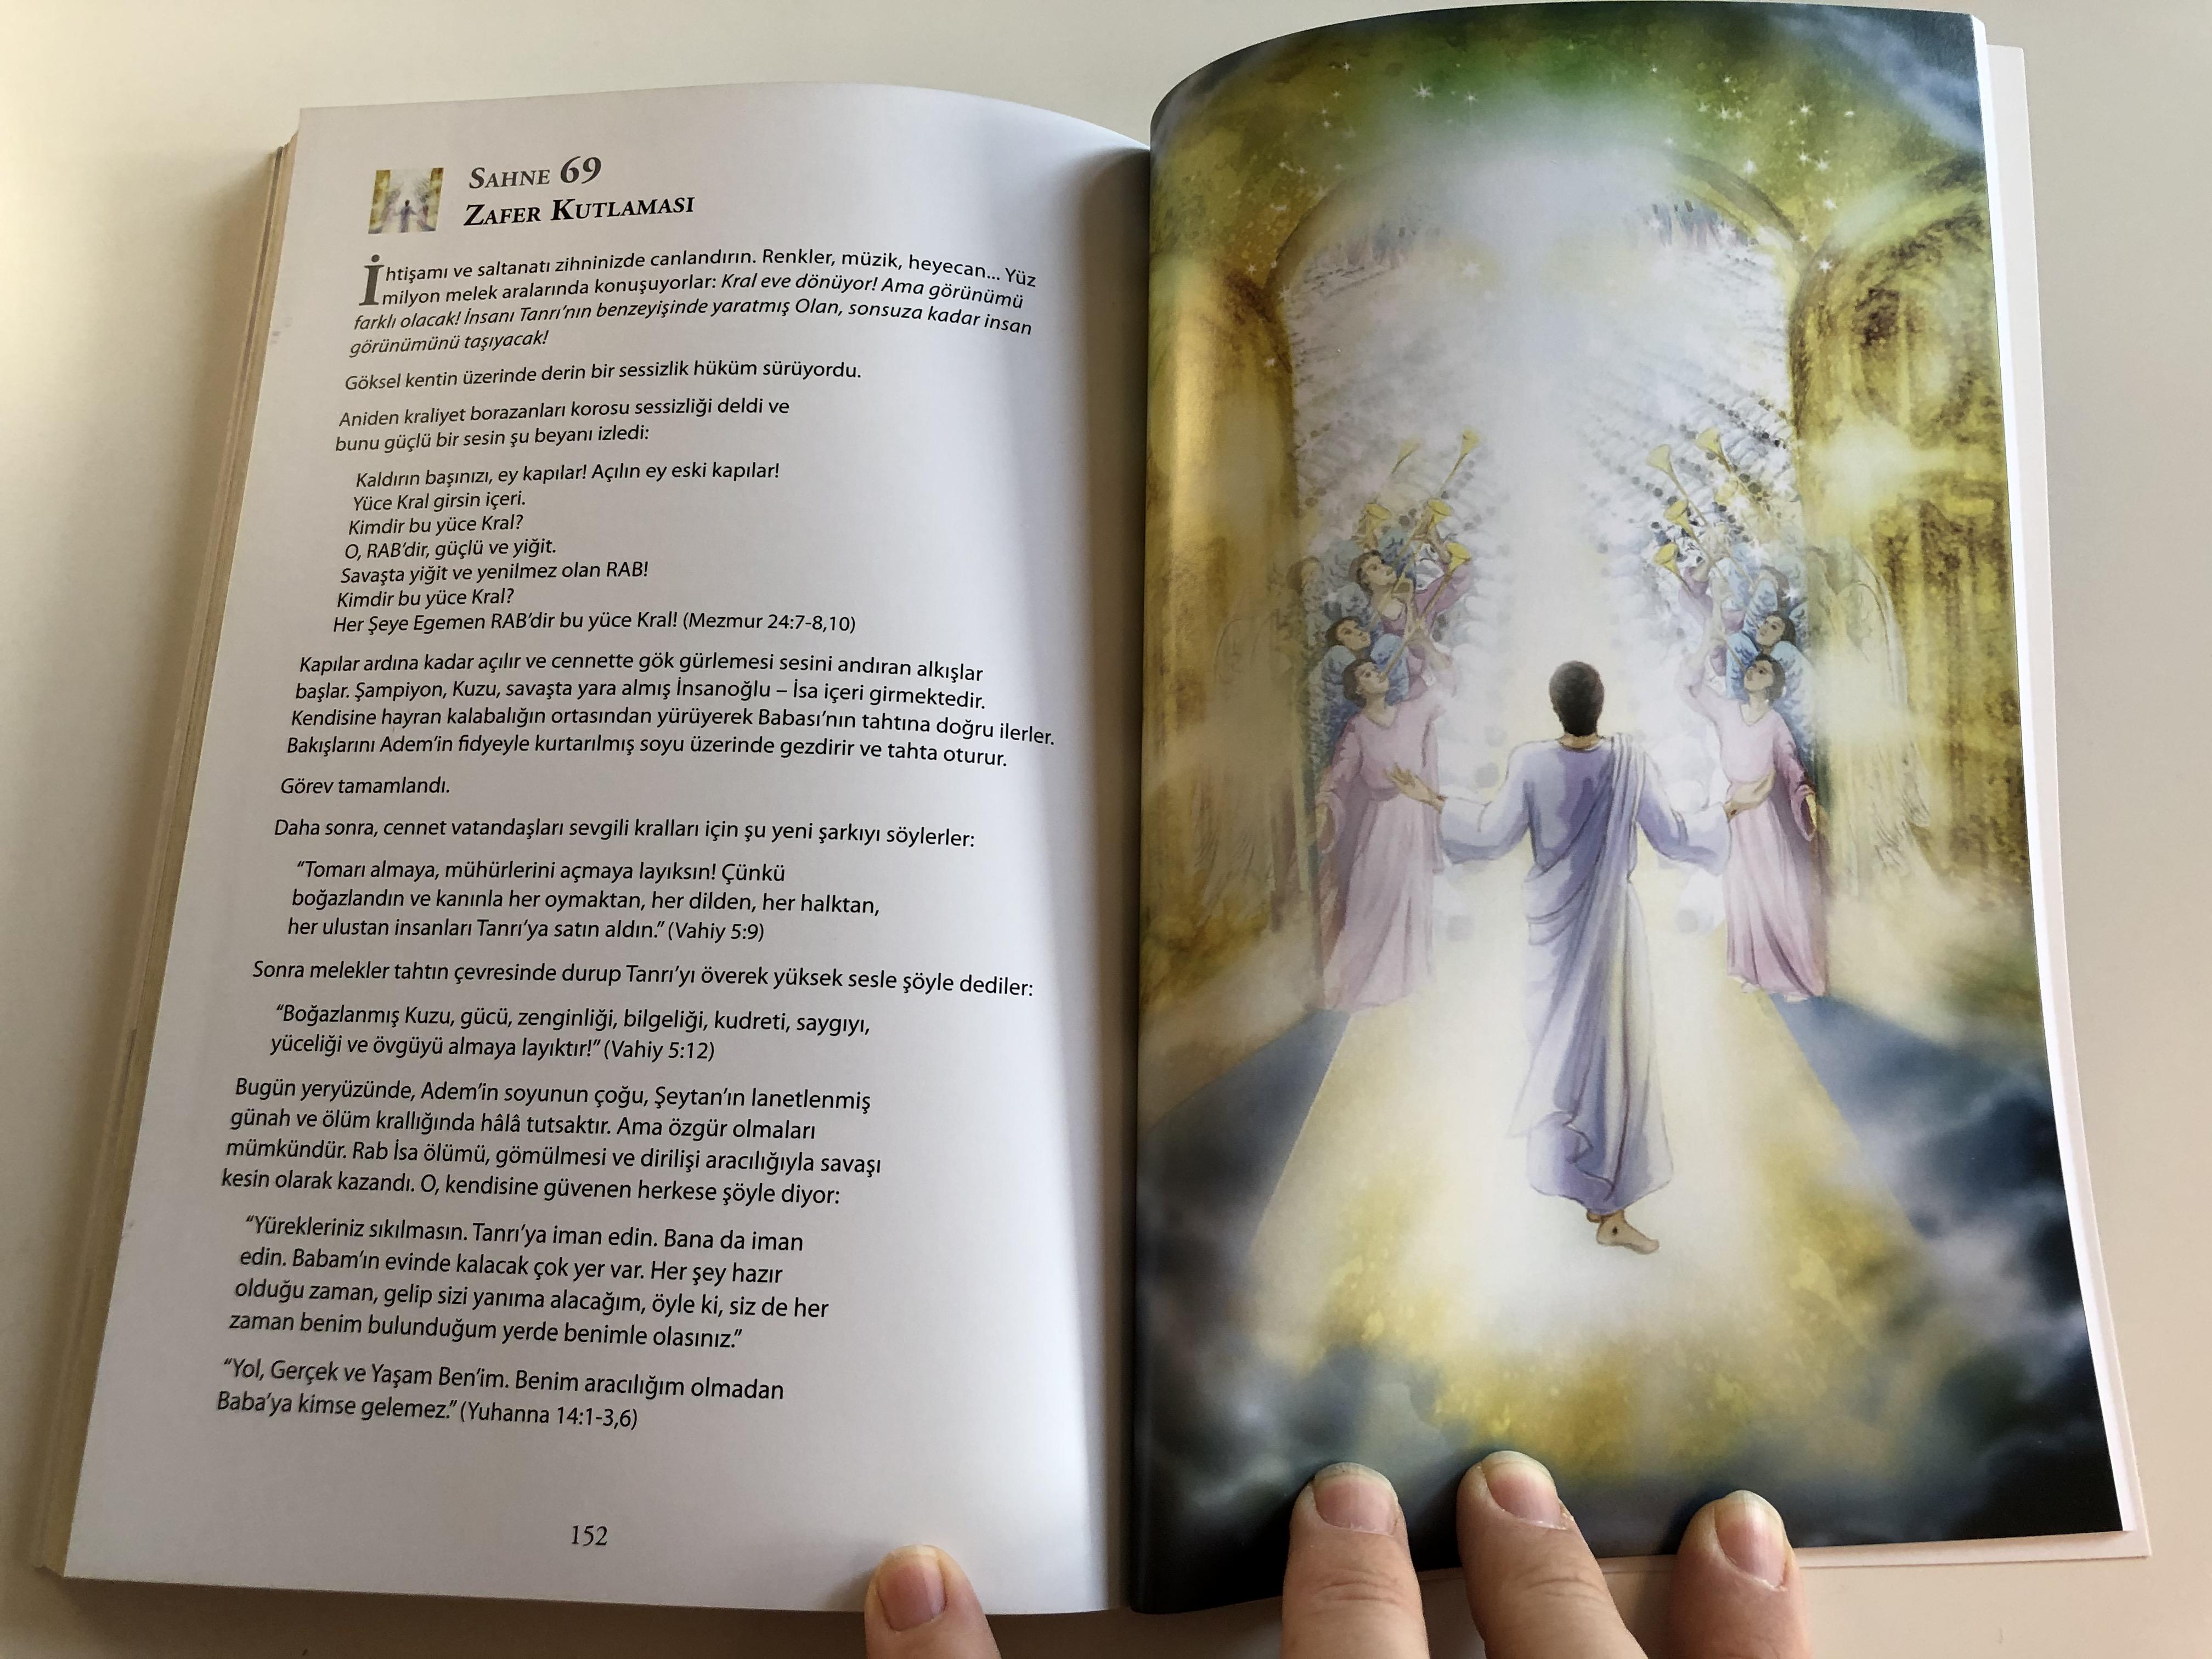 y-celik-krali-king-of-glory-70-bible-stories-for-children-turkish-language-edition-by-p.-d.-bramsen-11.jpg